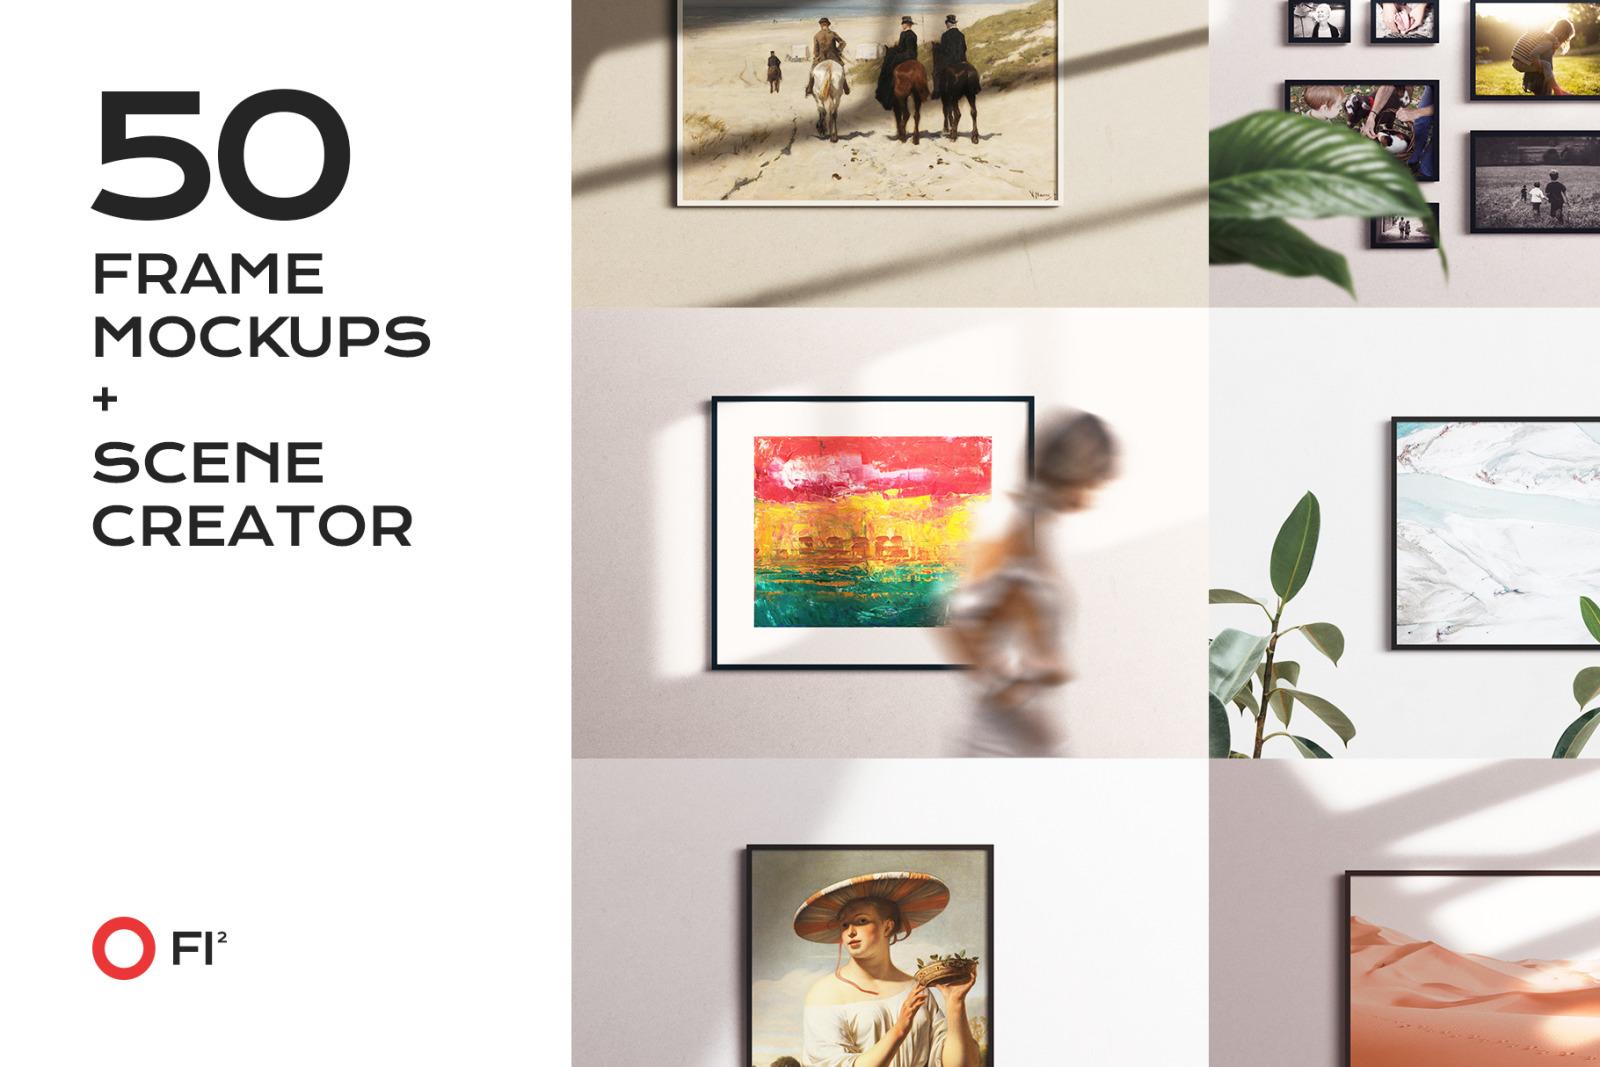 50 frame mockup bundle creator kit